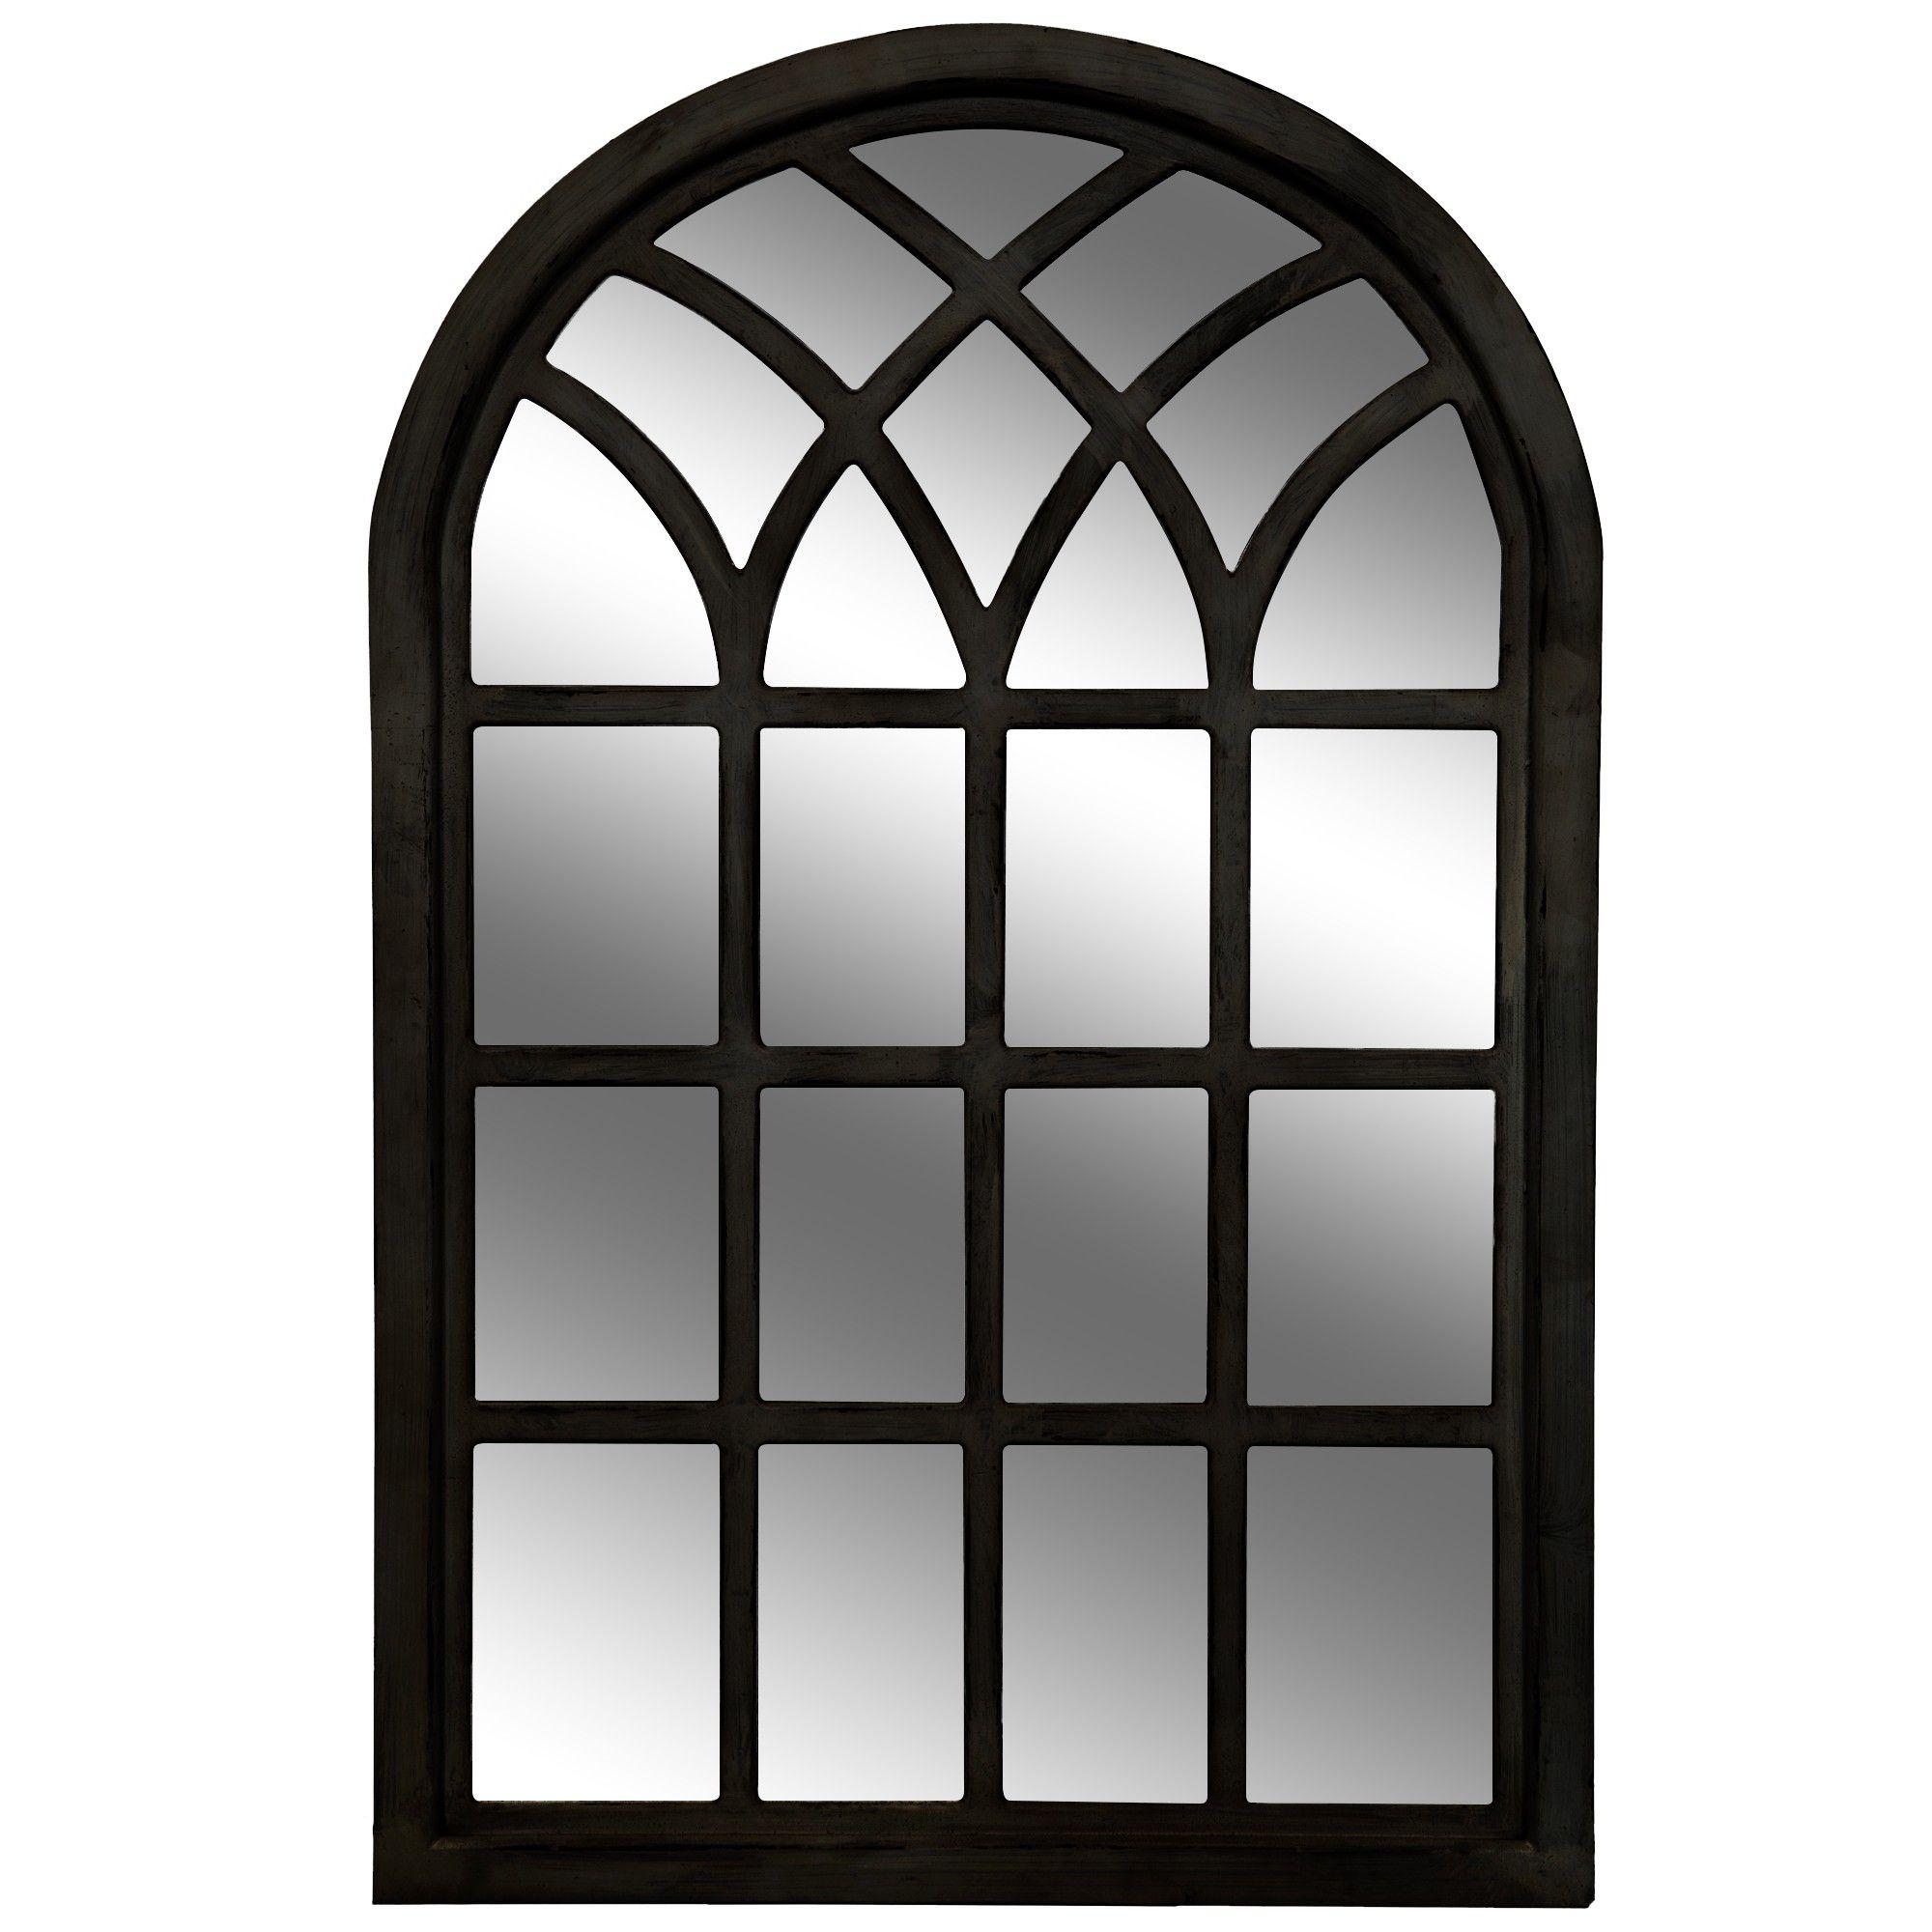 46x30 farmhouse cathedral windowpane wall mirror black